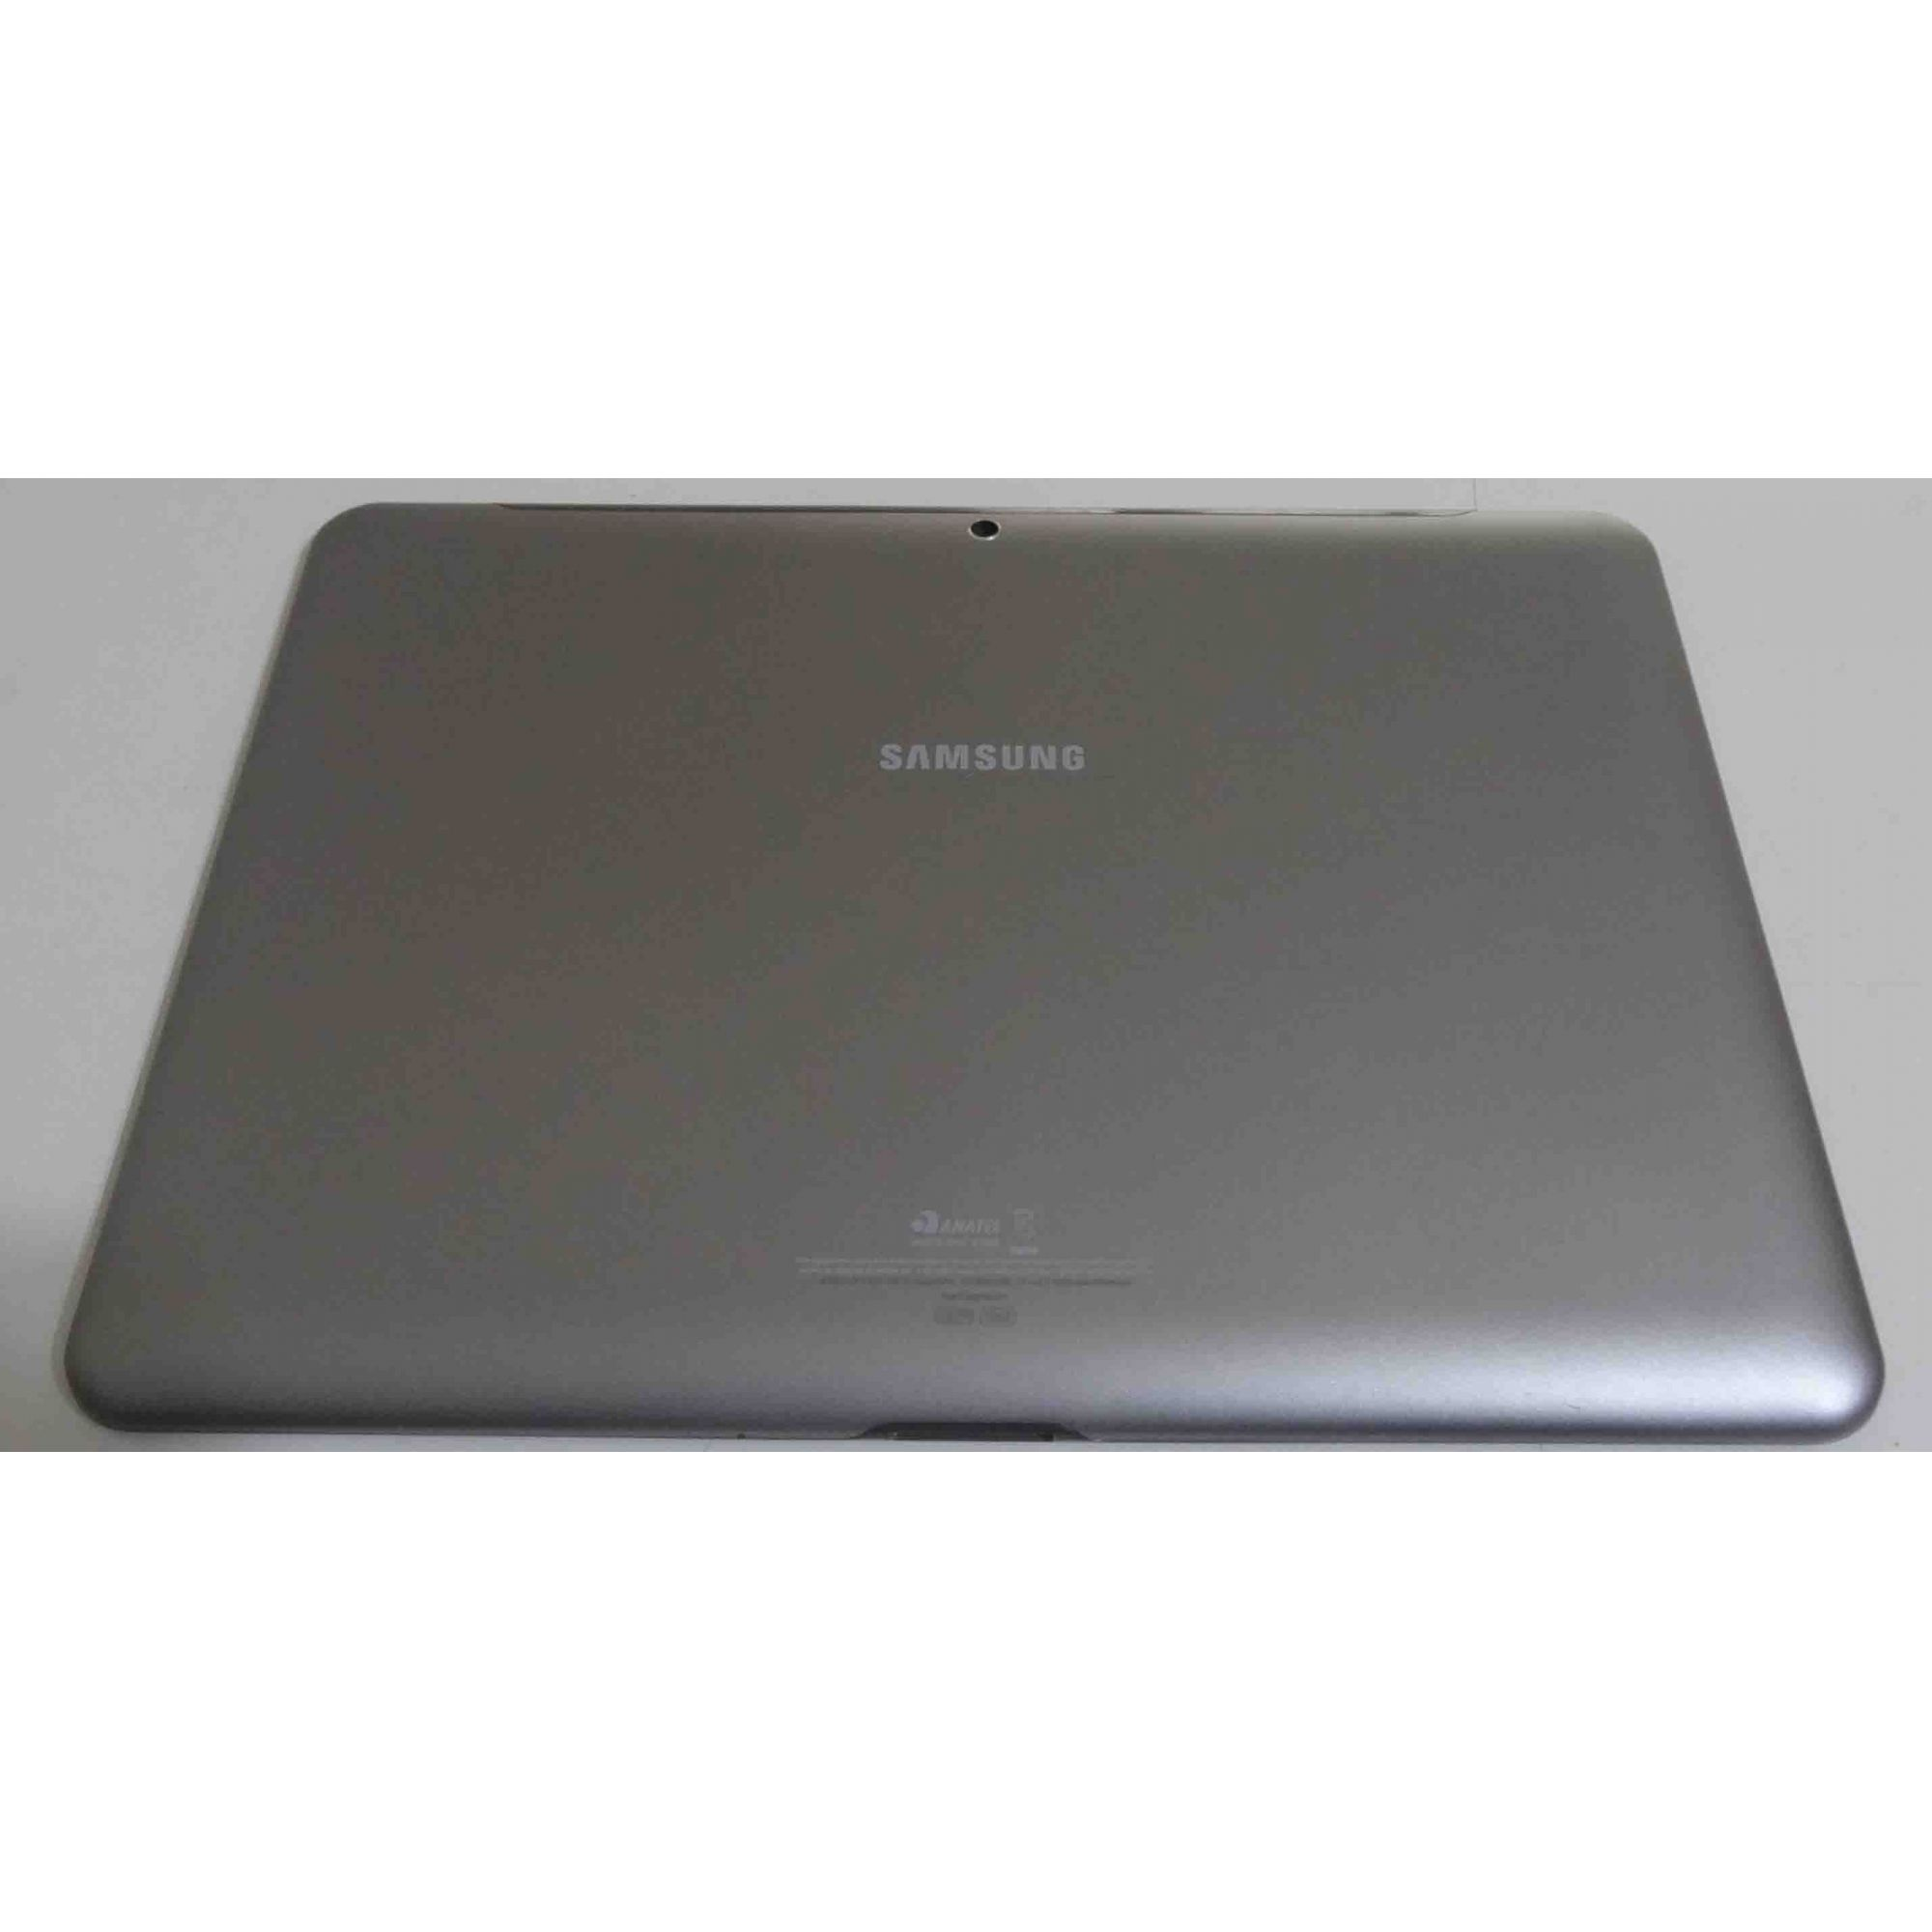 Tablet Samsung Galaxy Tab 2 10.1'' GT-P5110, Wi-Fi, 16GB (Não Enviamos)